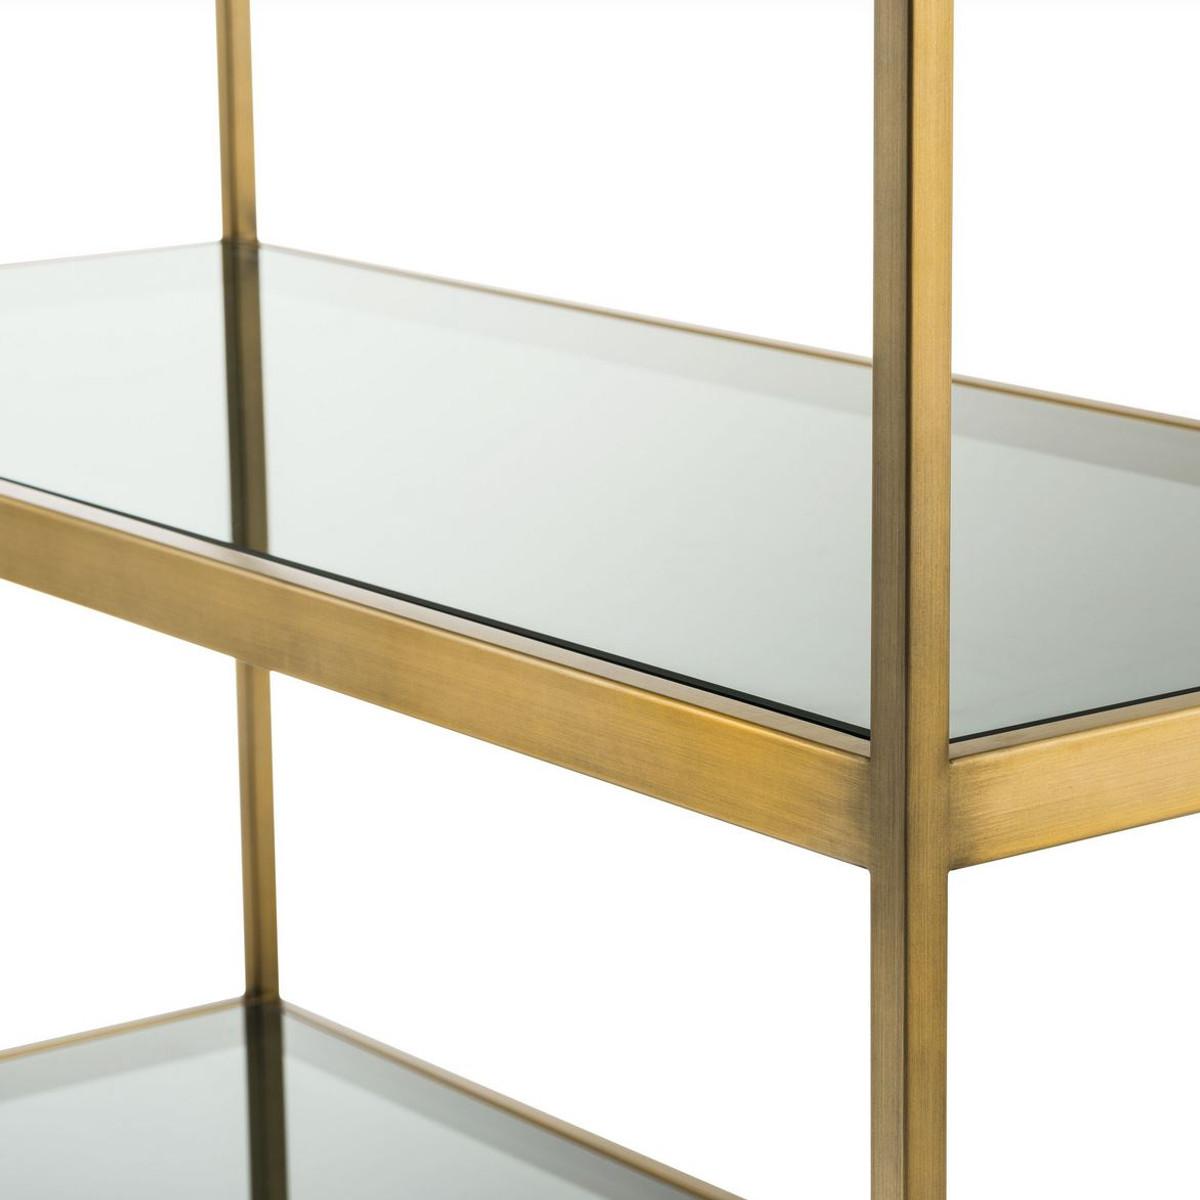 Casa Padrino Luxus Regalschrank Messing Grau 95 X 40 X H 225 Cm